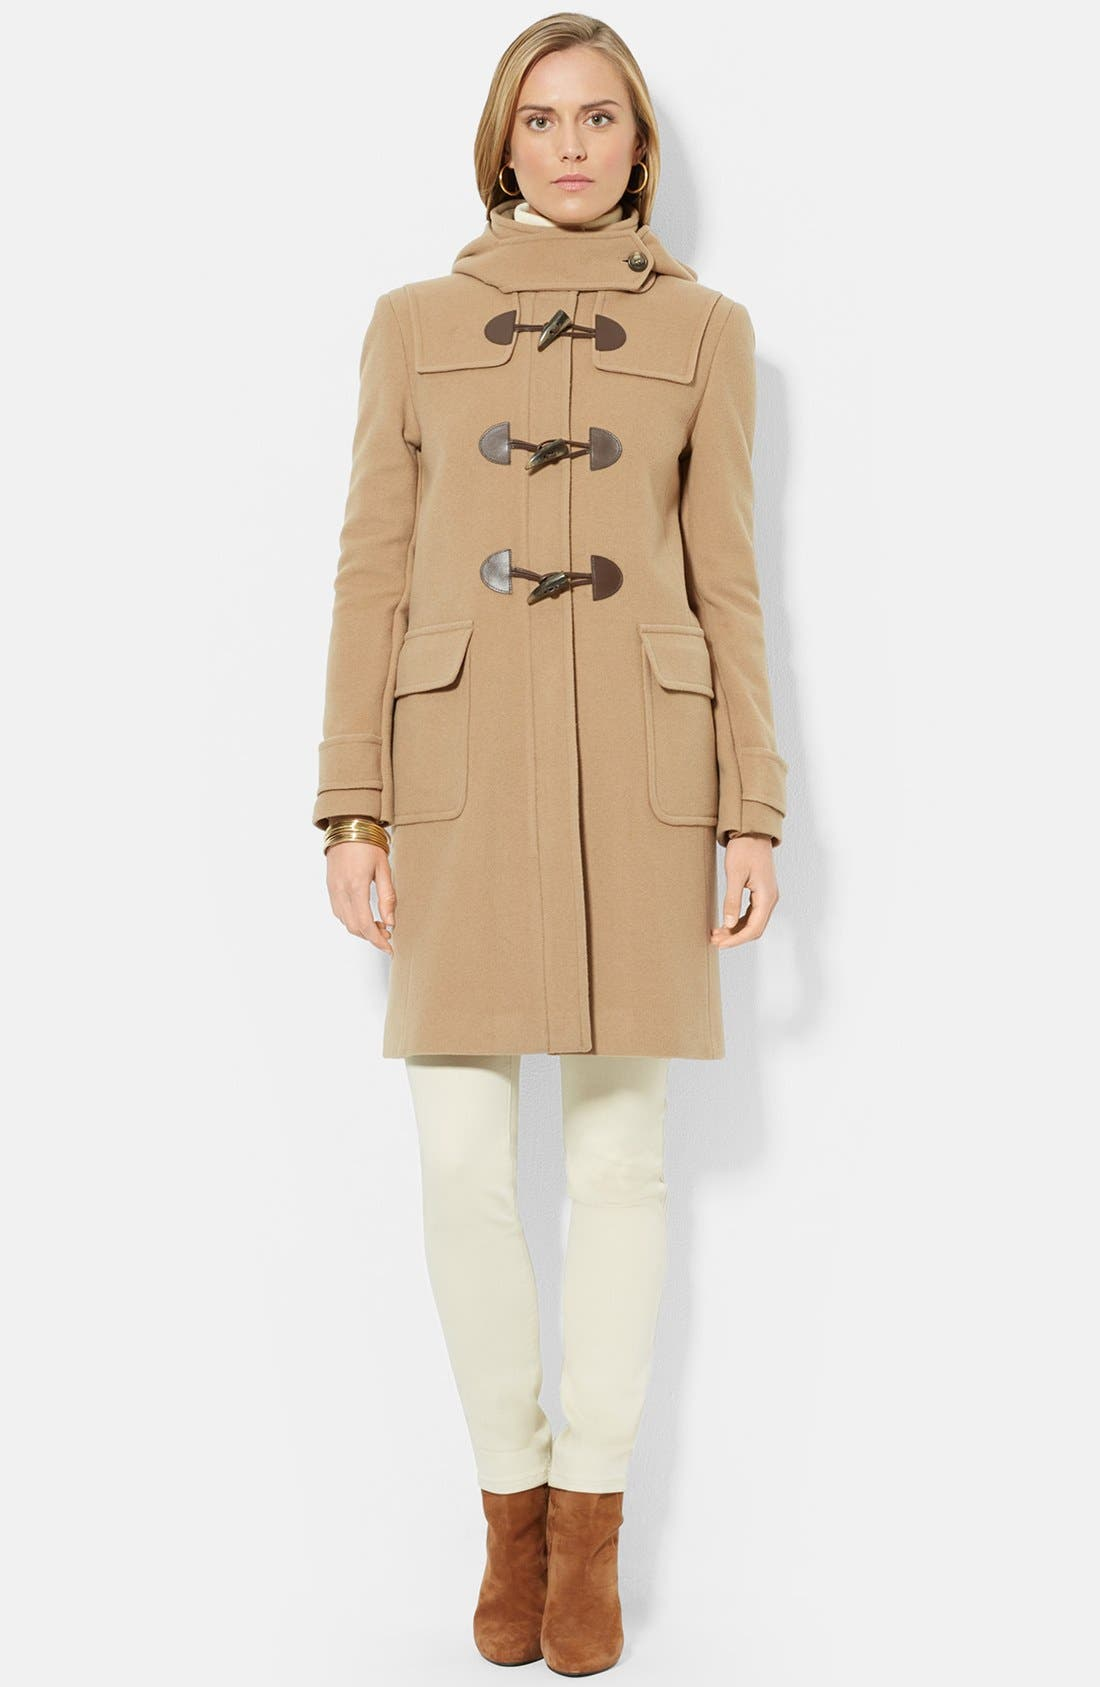 Stand Collar Wool Blend Duffle Coat,                             Main thumbnail 1, color,                             Laurel Camel